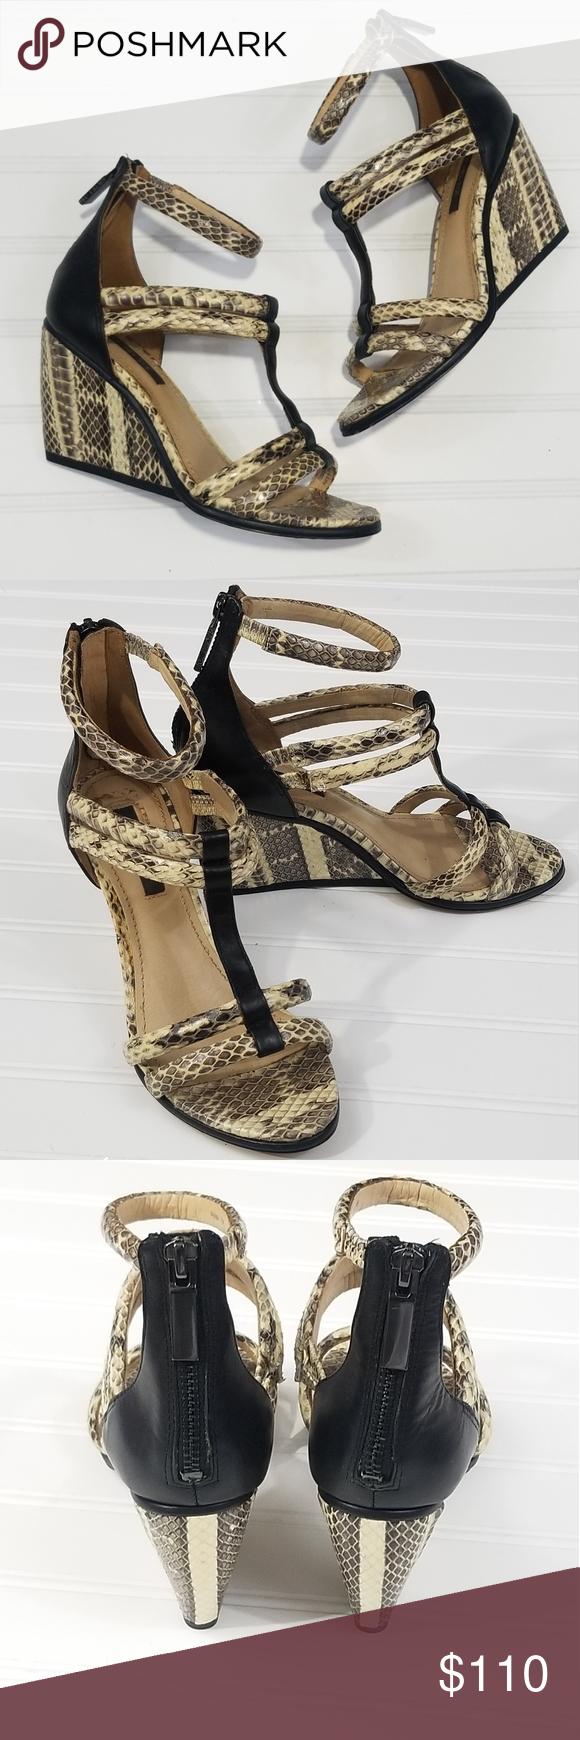 Shoe Game: Comfort & Style - Houston Wedding Blog | Ankle